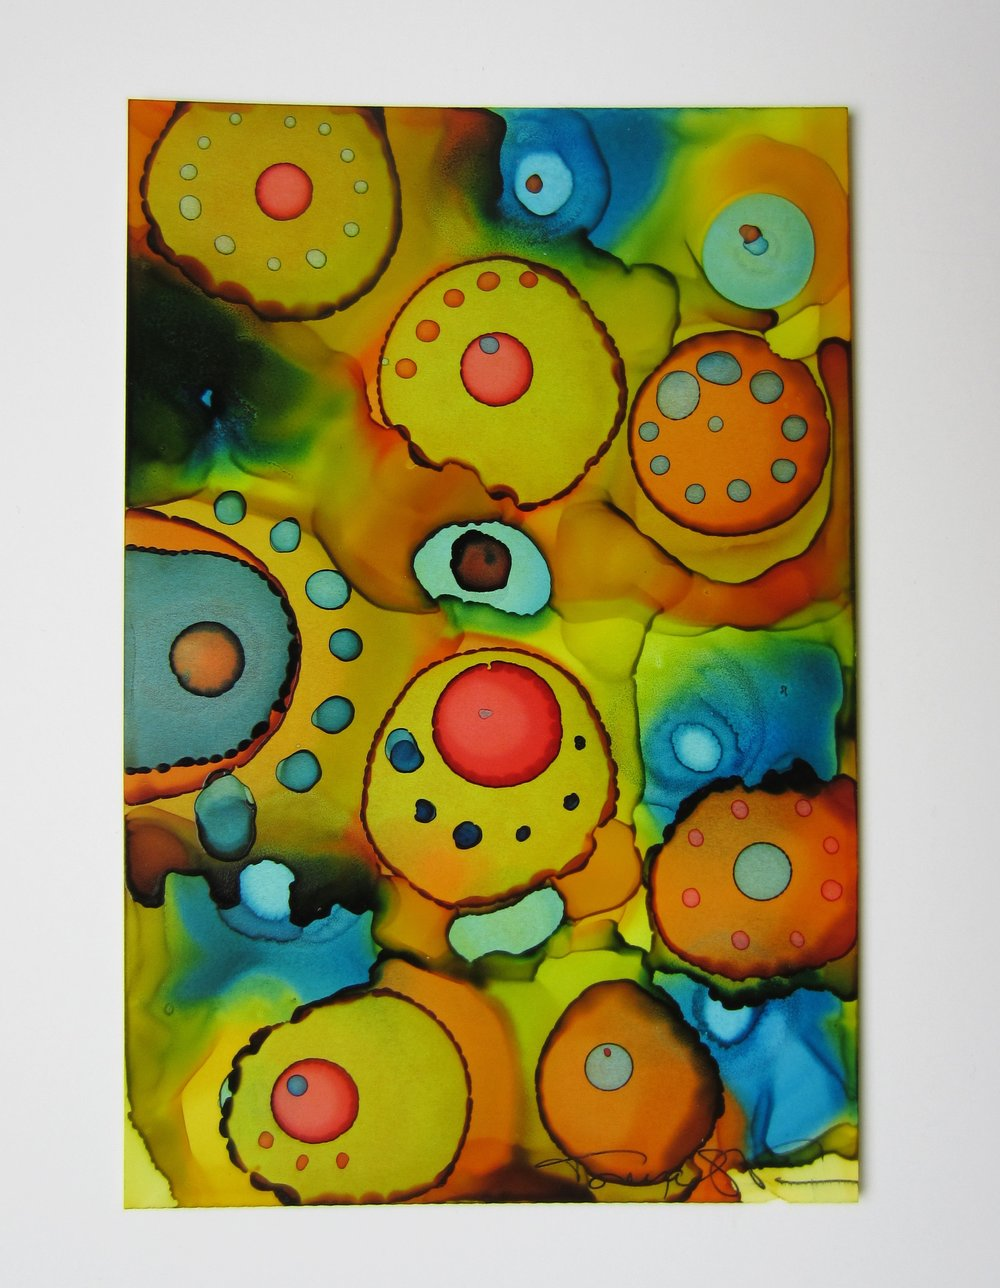 Cells 10